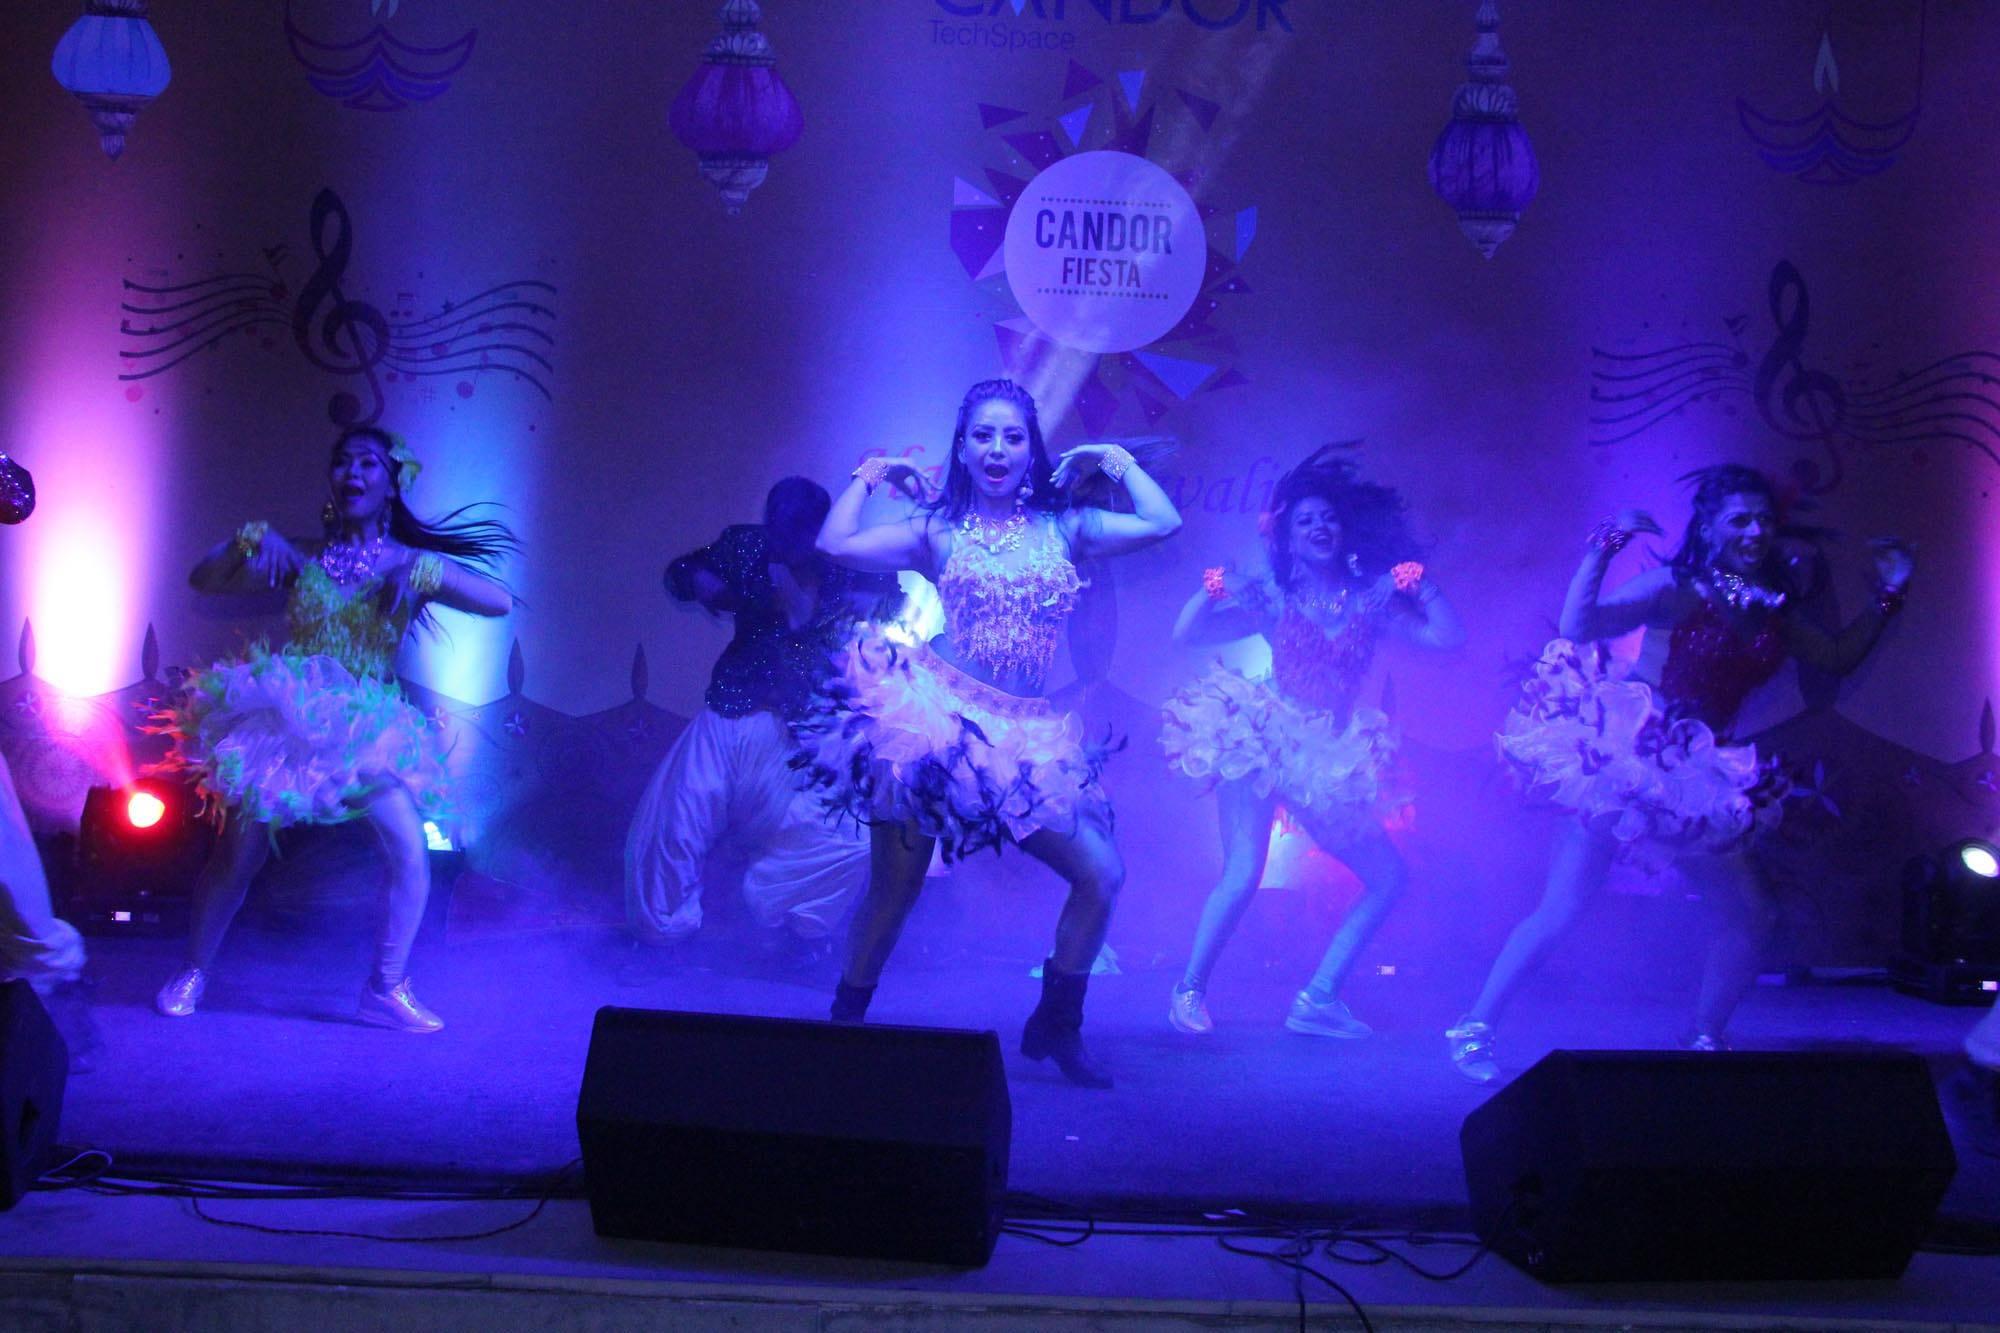 candor-diwali-Noida-135-4.jpg